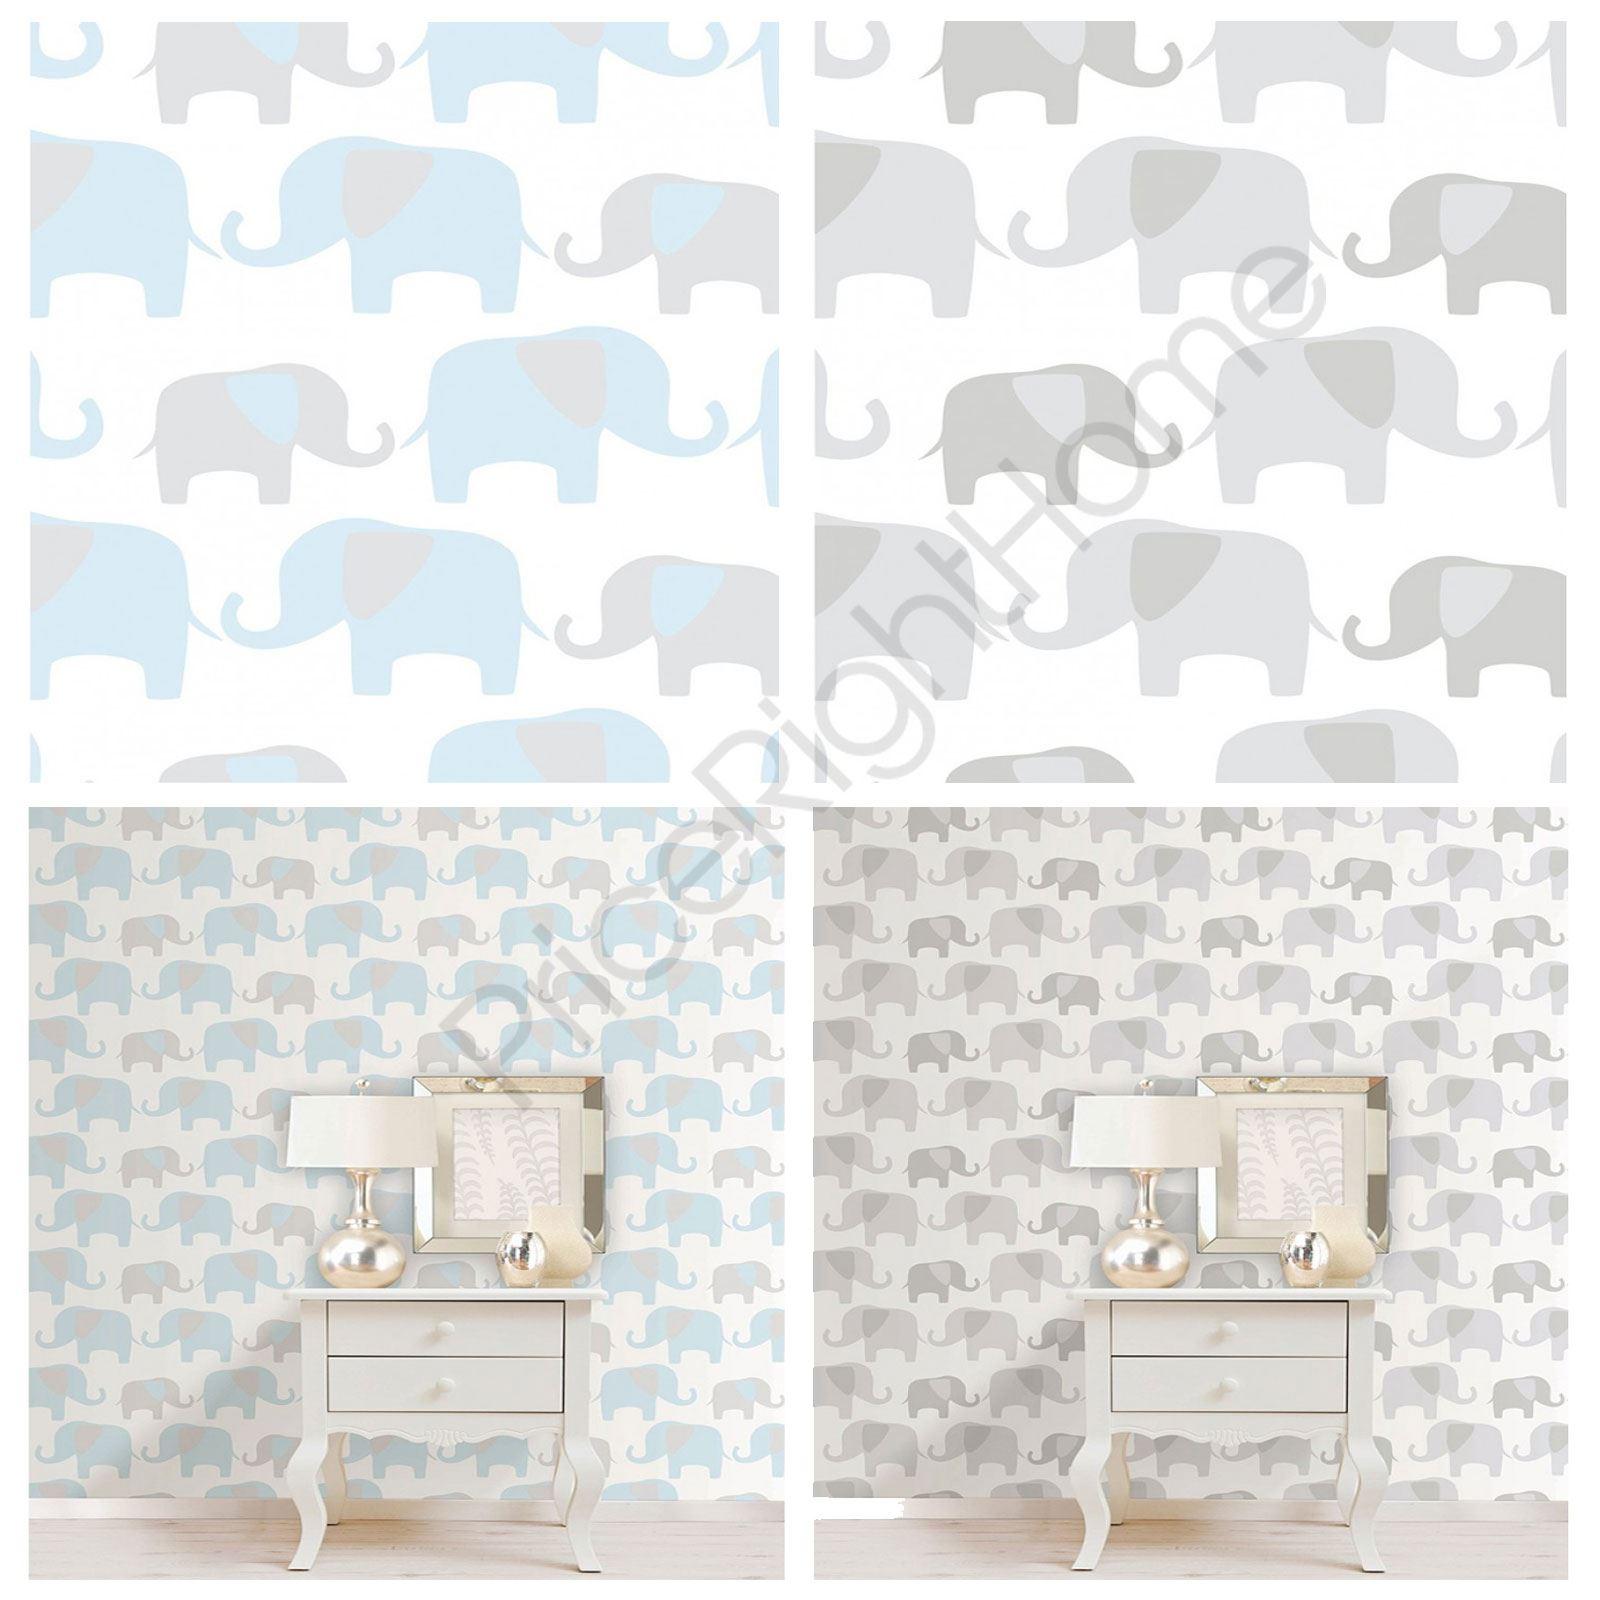 NUWALLPAPER ELEPHANT PARADE PEEL & STICK WALLPAPER GREY & BLUE